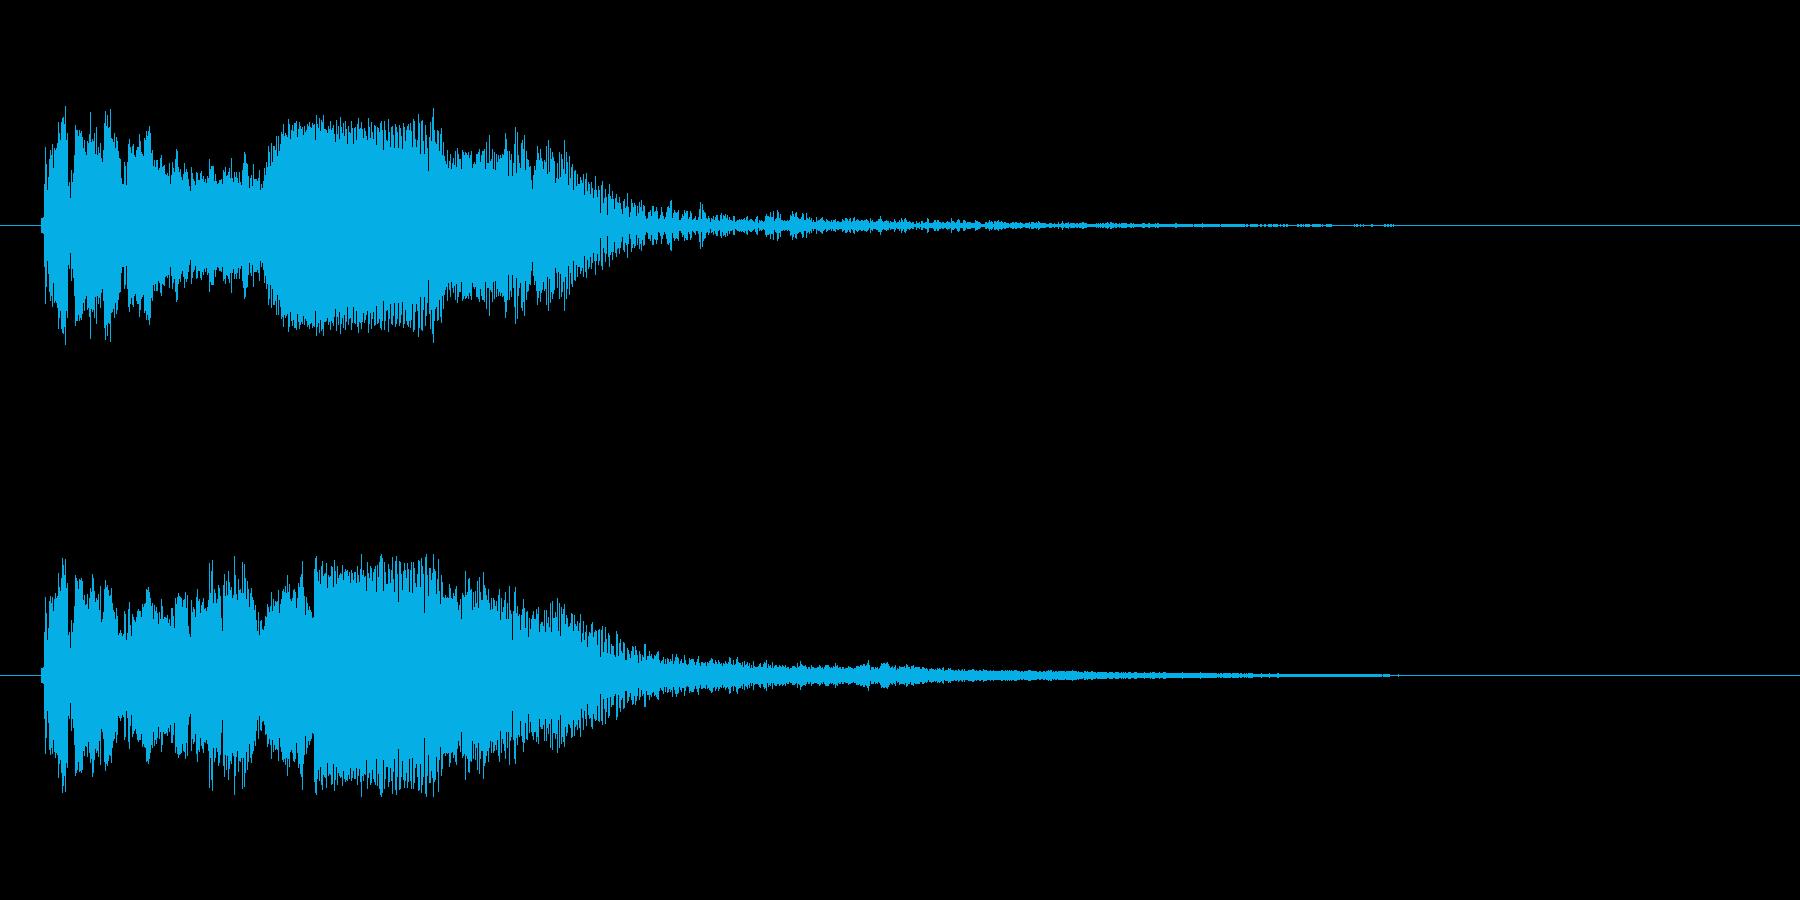 FMラジオジングルキットSWEEPERの再生済みの波形